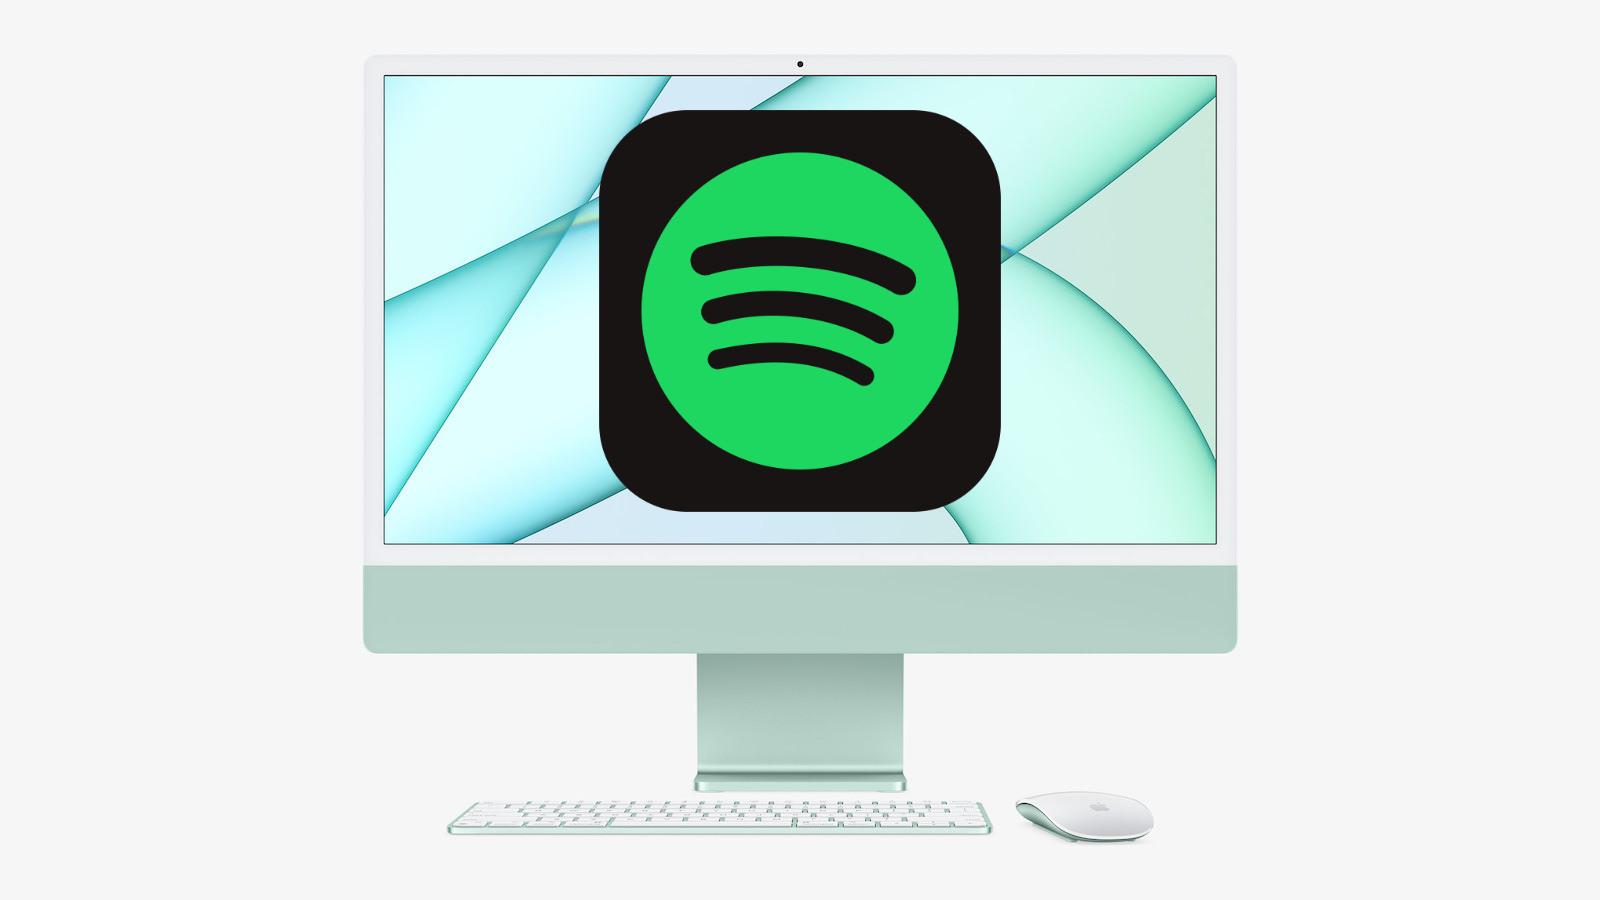 Spotify and m1 imac